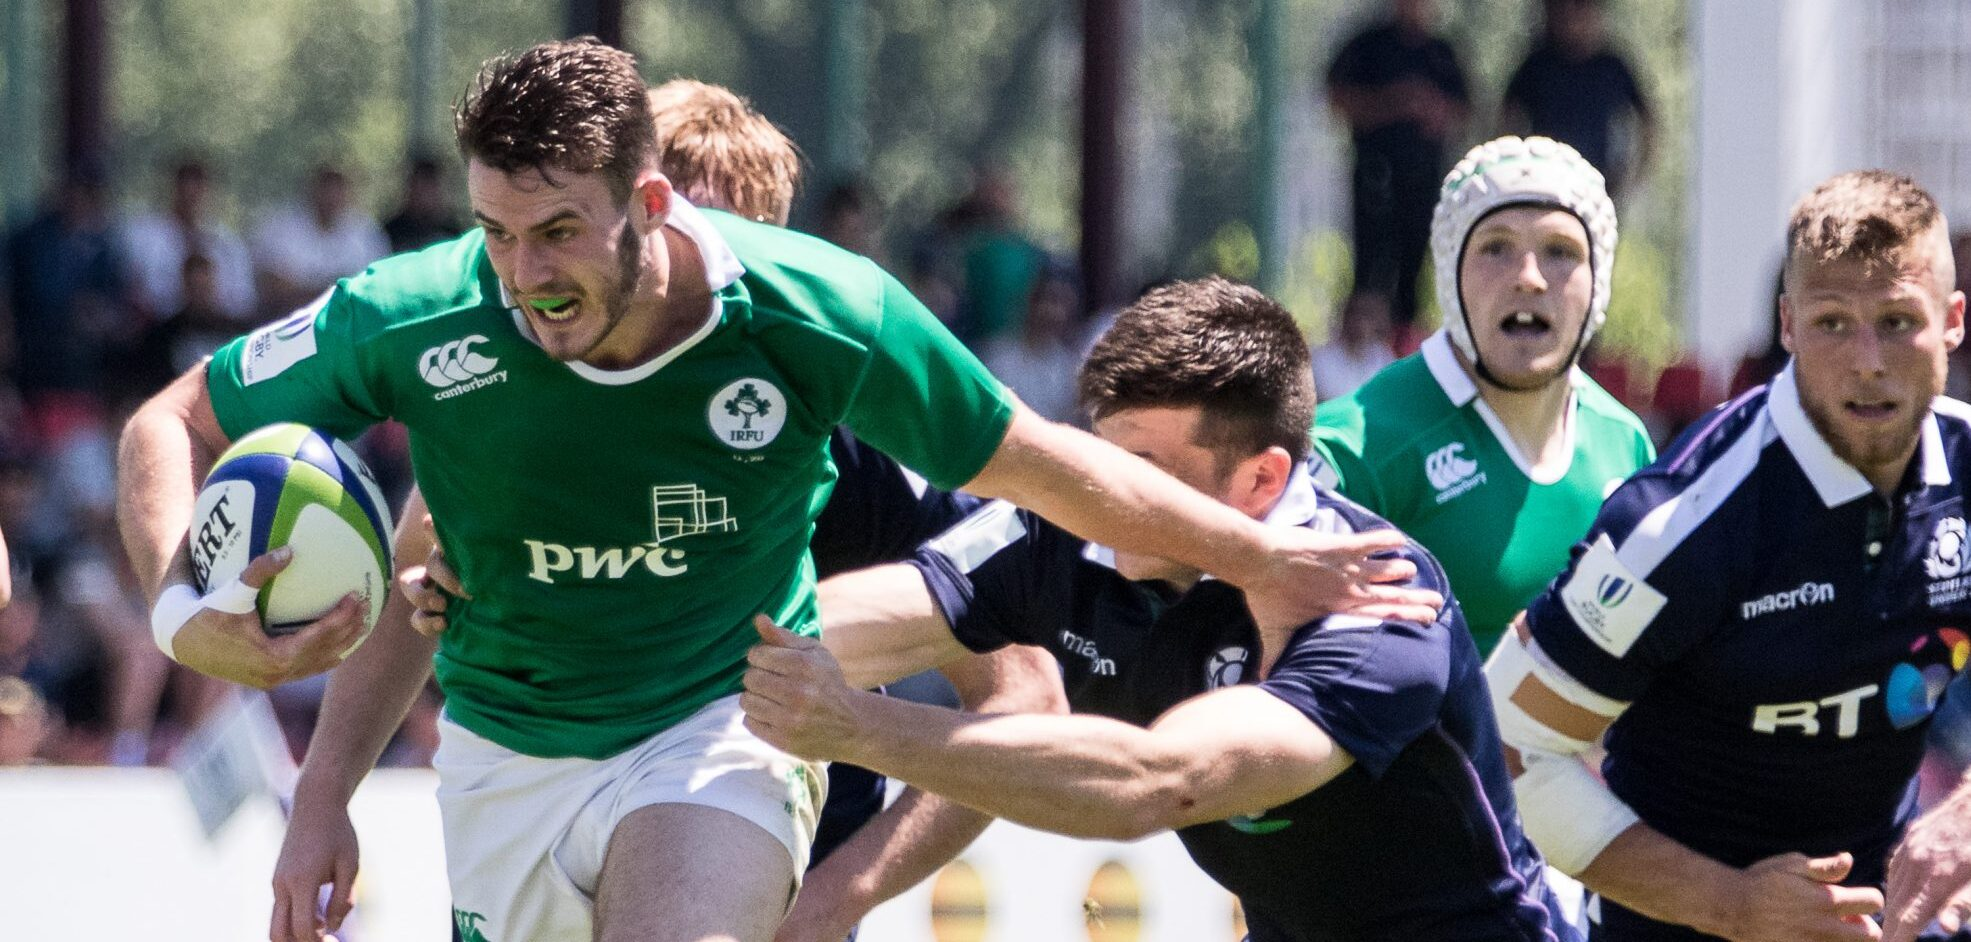 U20 Championship: Ireland U20 28 Scotland U20 32